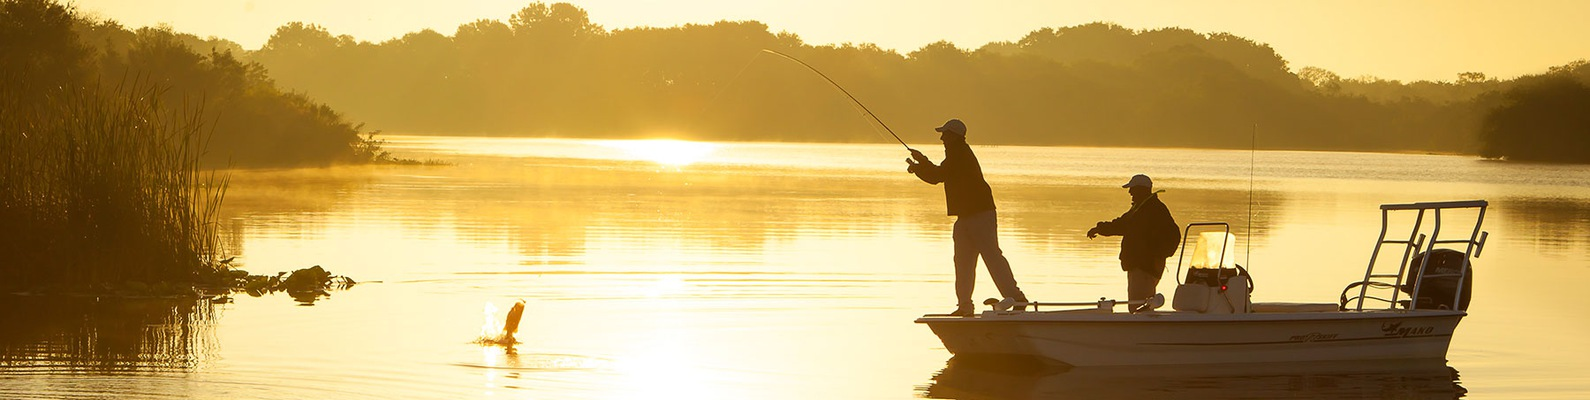 Рыбалка удочки видео йошкар ола каталог